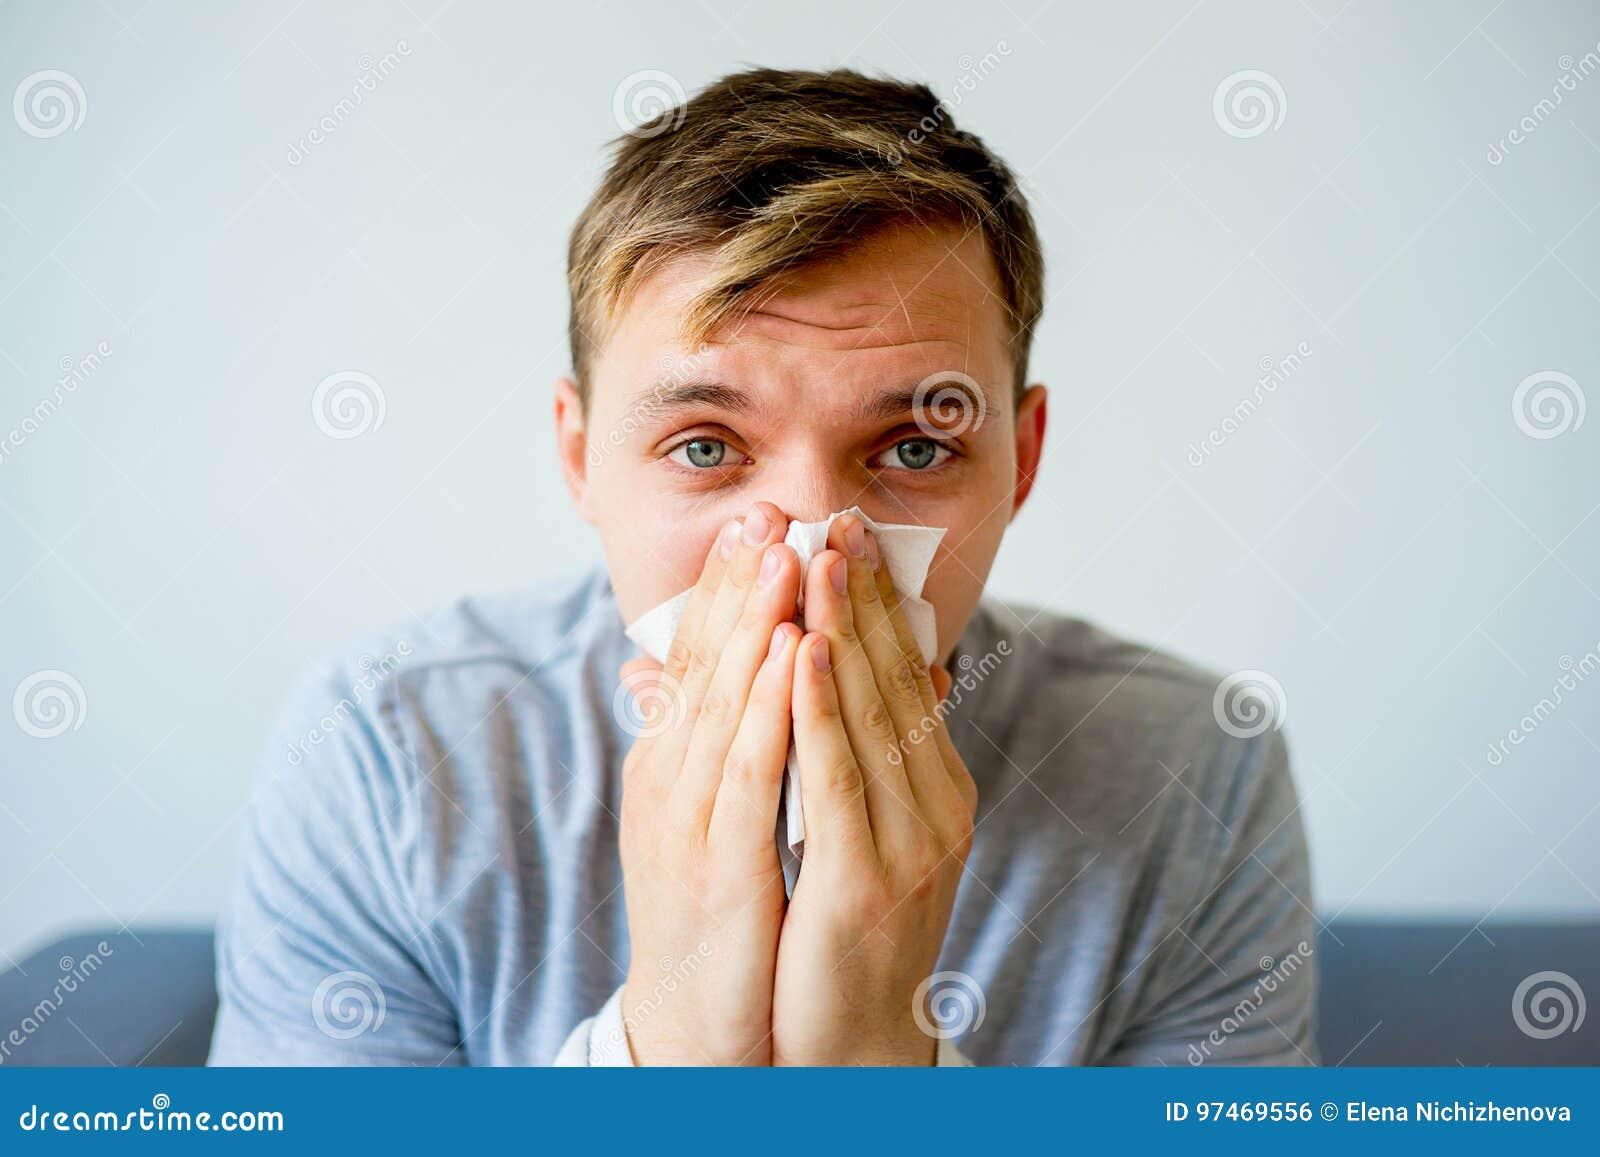 Man having cold